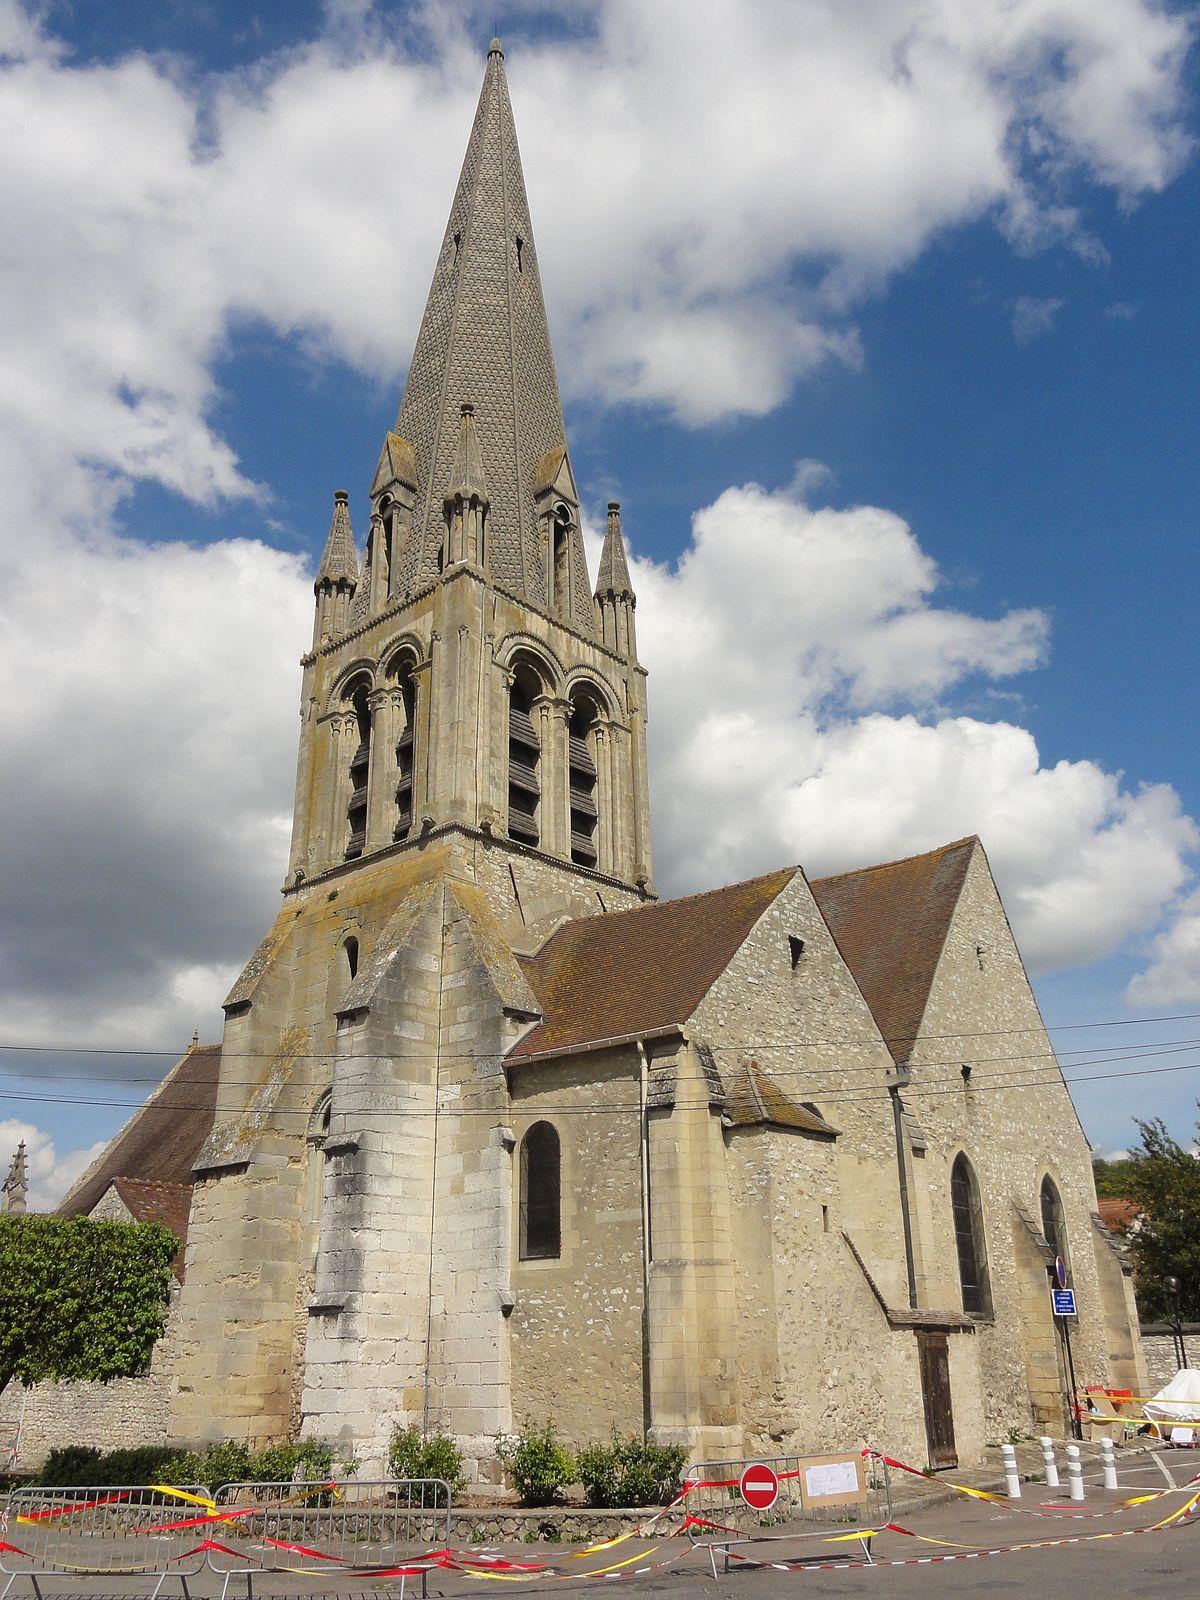 Limay wikip dia - La petite cheminee saint aubin ...